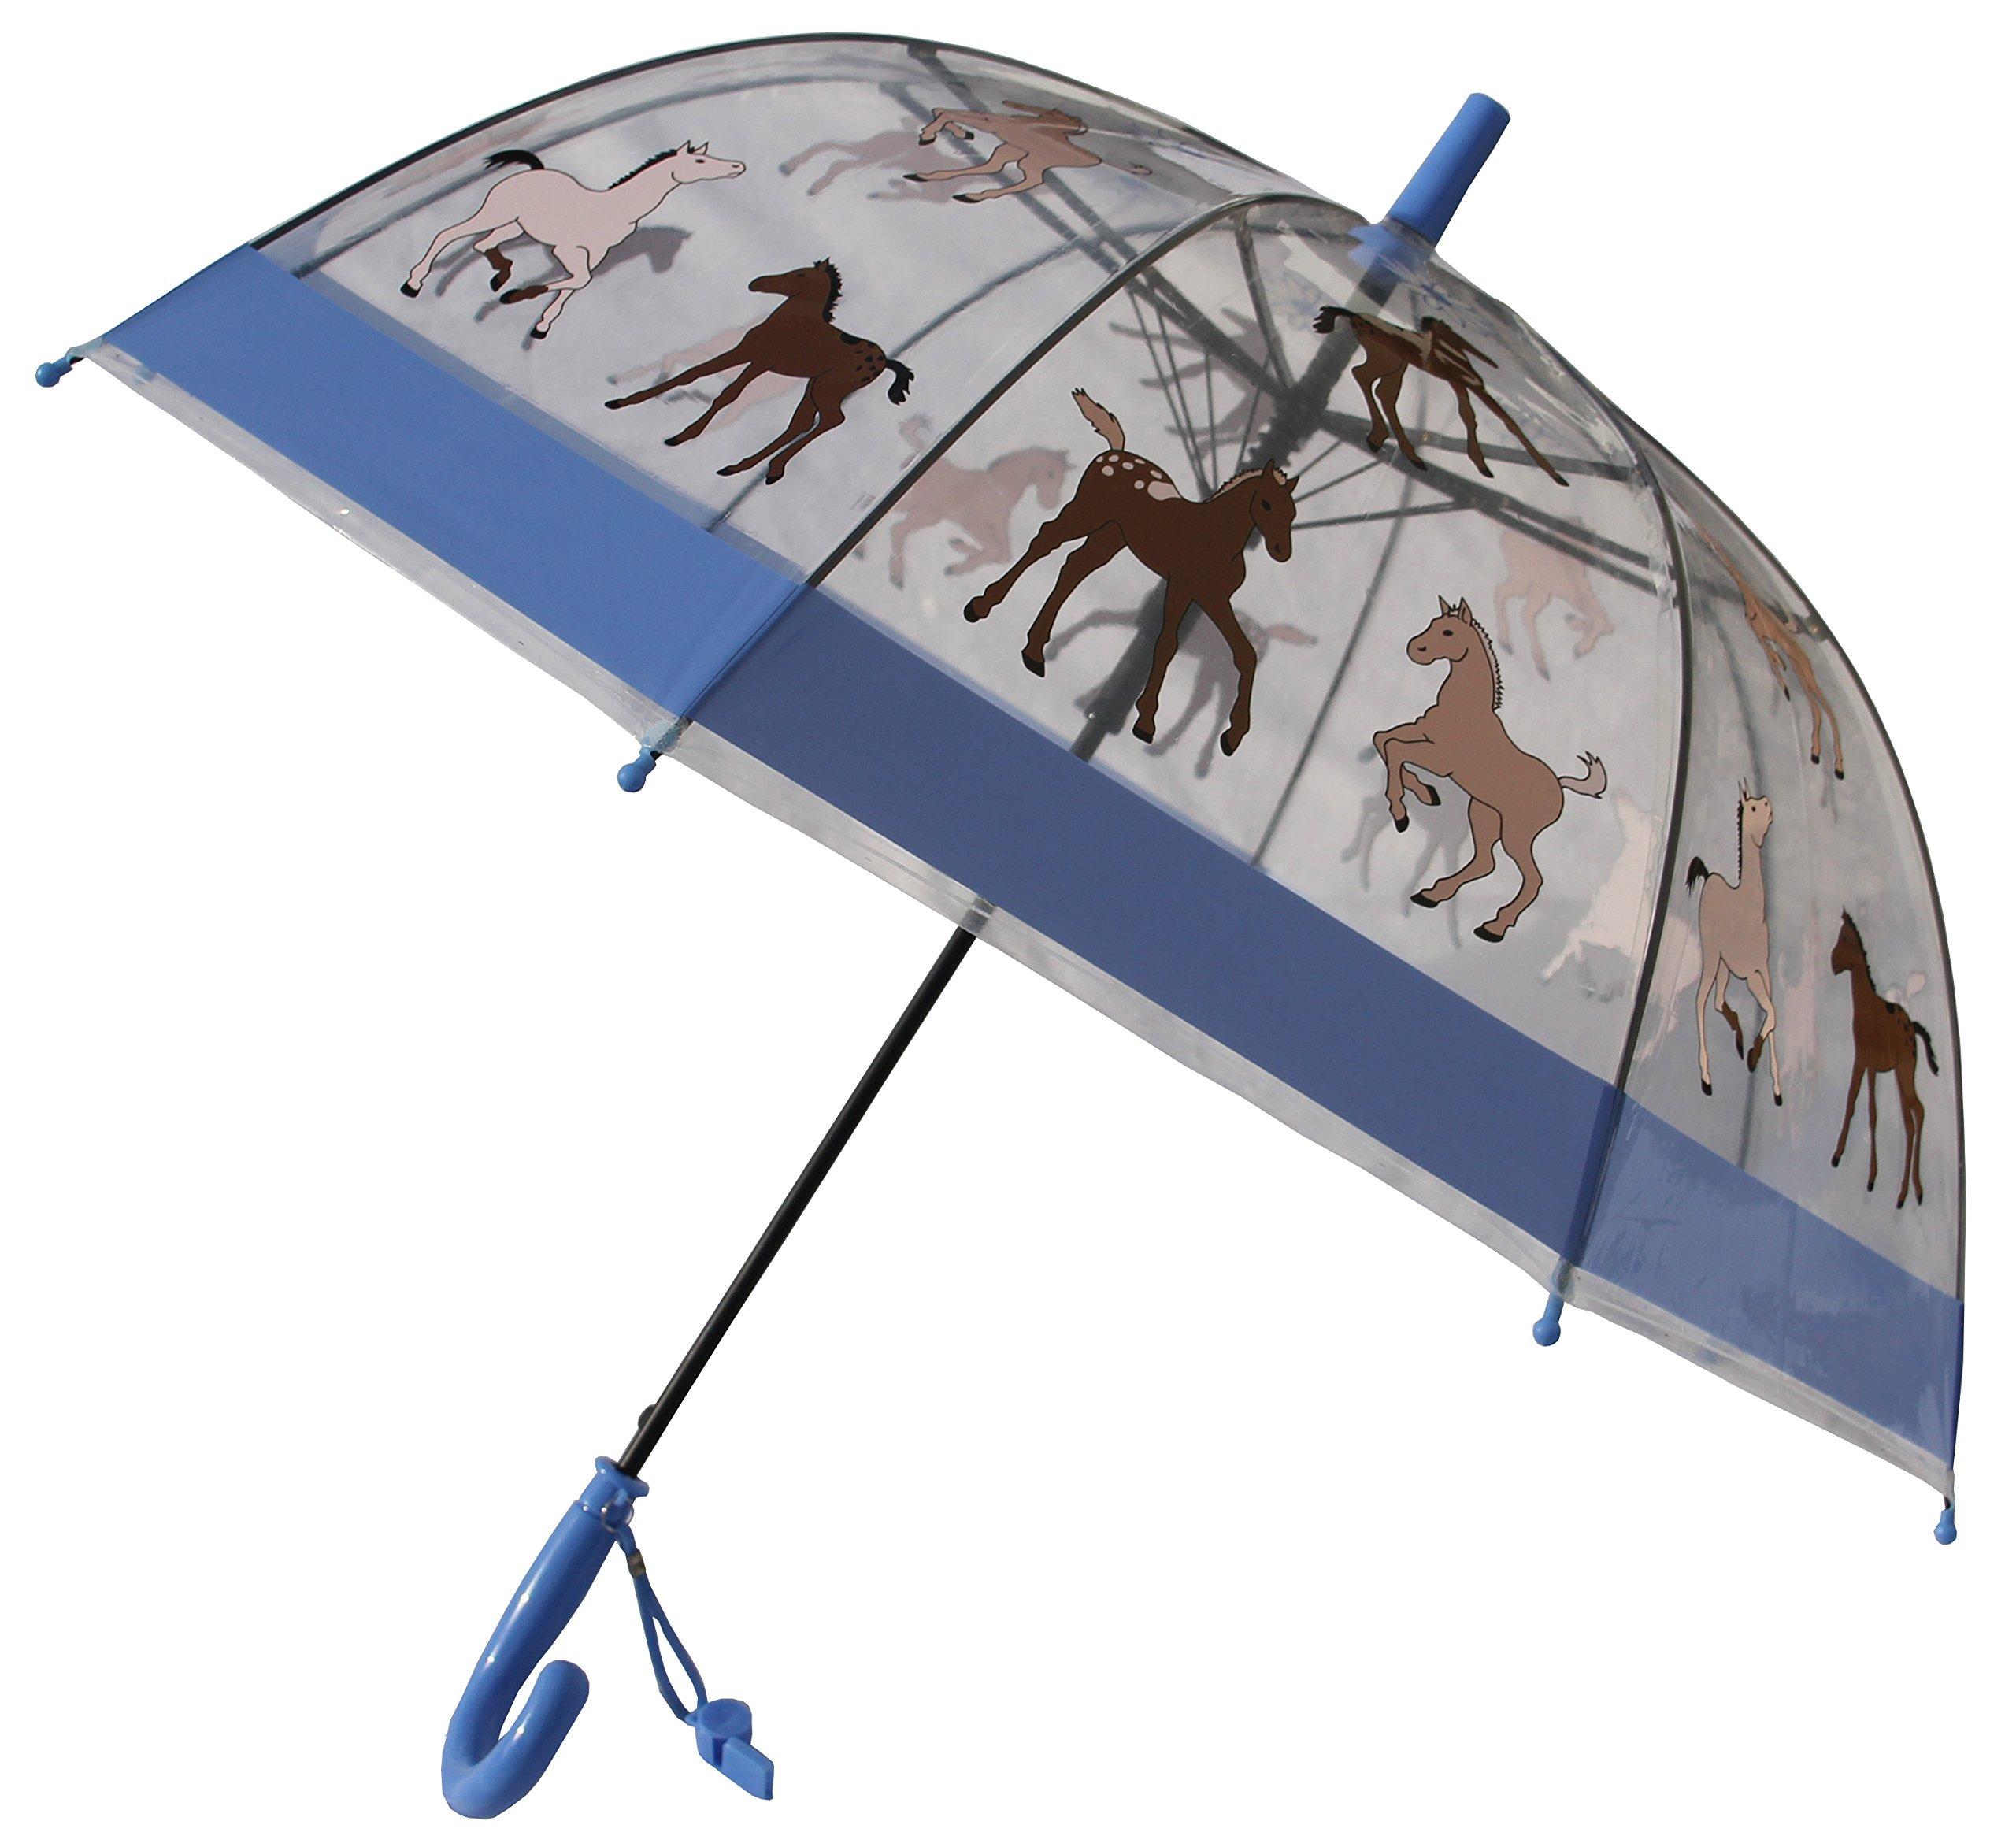 Foxfire for Kids Clear Dome Umbrella (Blue Pony)